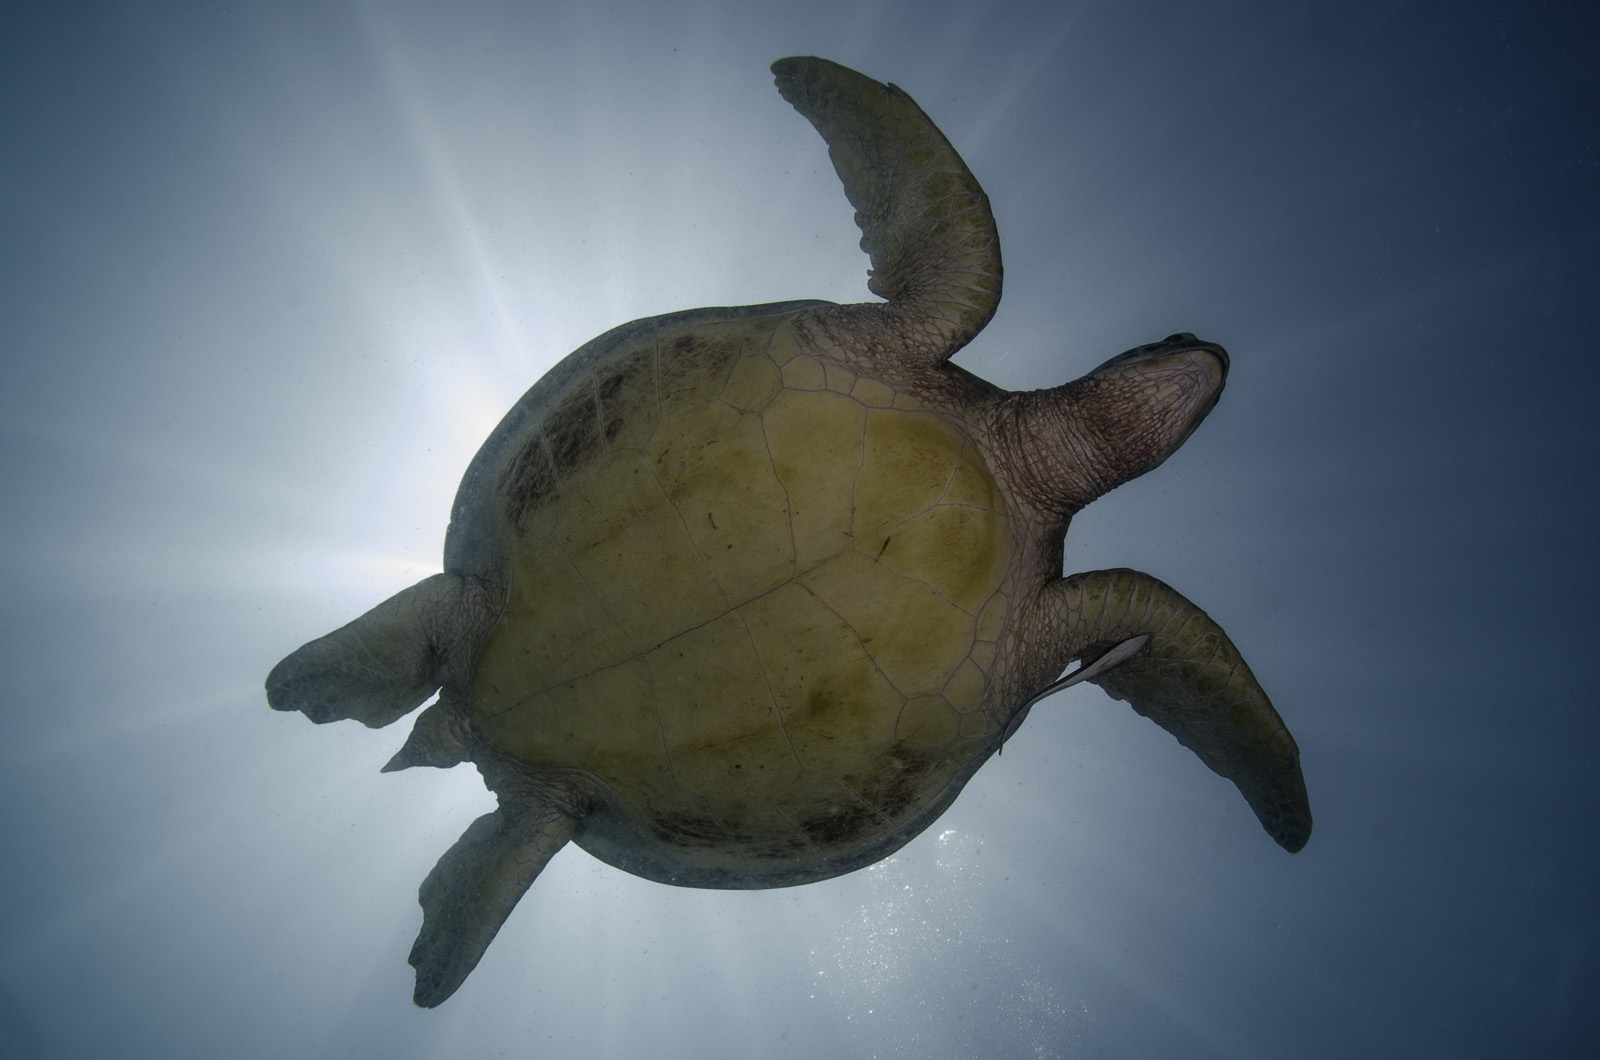 a-swimming-green-sea-turtle-chelonia-mydas-on-the-scuba-junkie-house-reef-mabul-island-tino-hermann.jpg